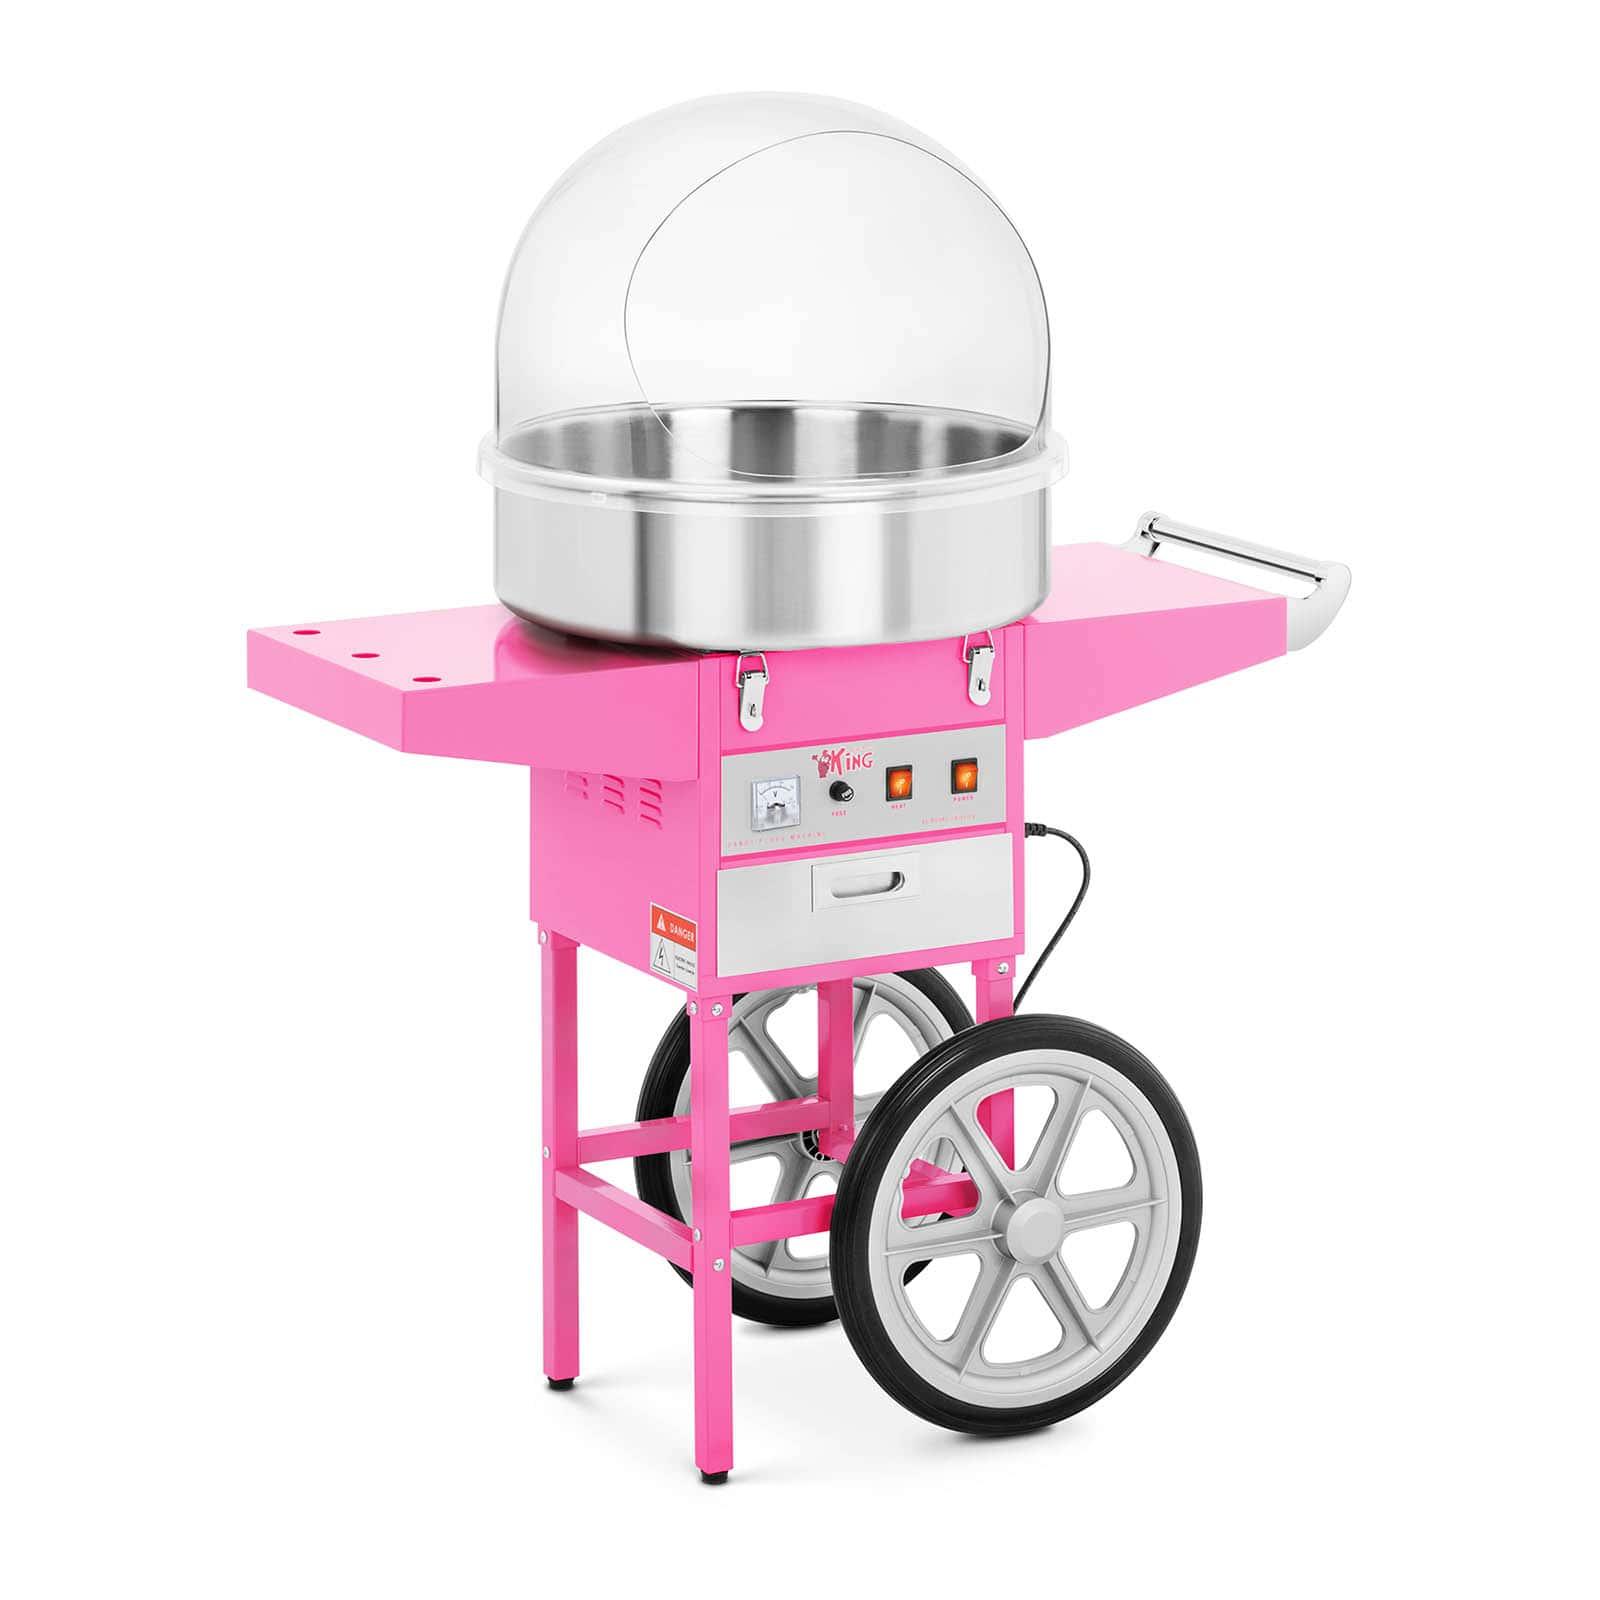 Candyfloss-maskiner og tilbehør